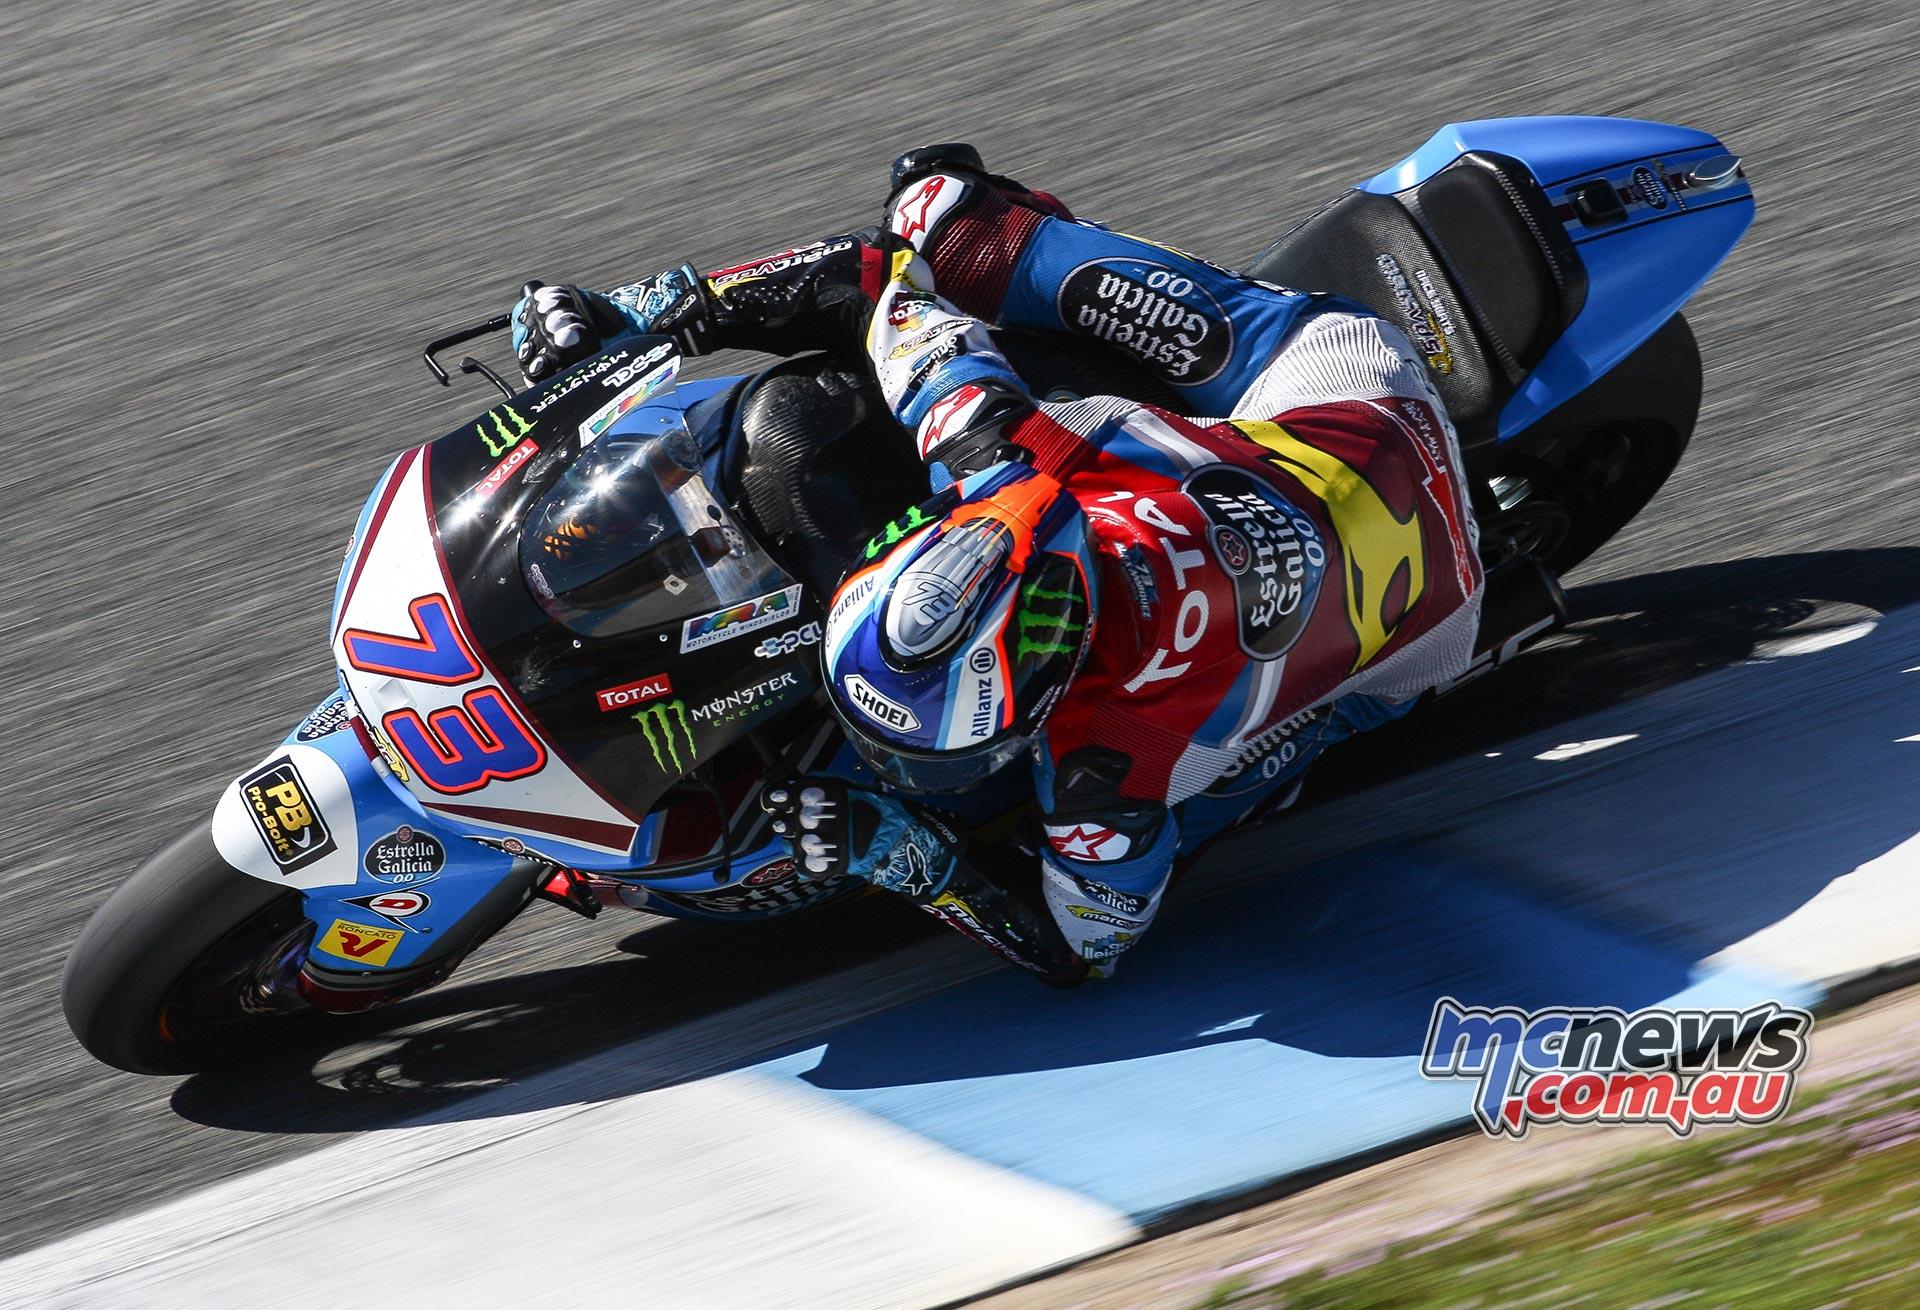 Alex Marquez below pole lap record as testing wraps up in Jerez